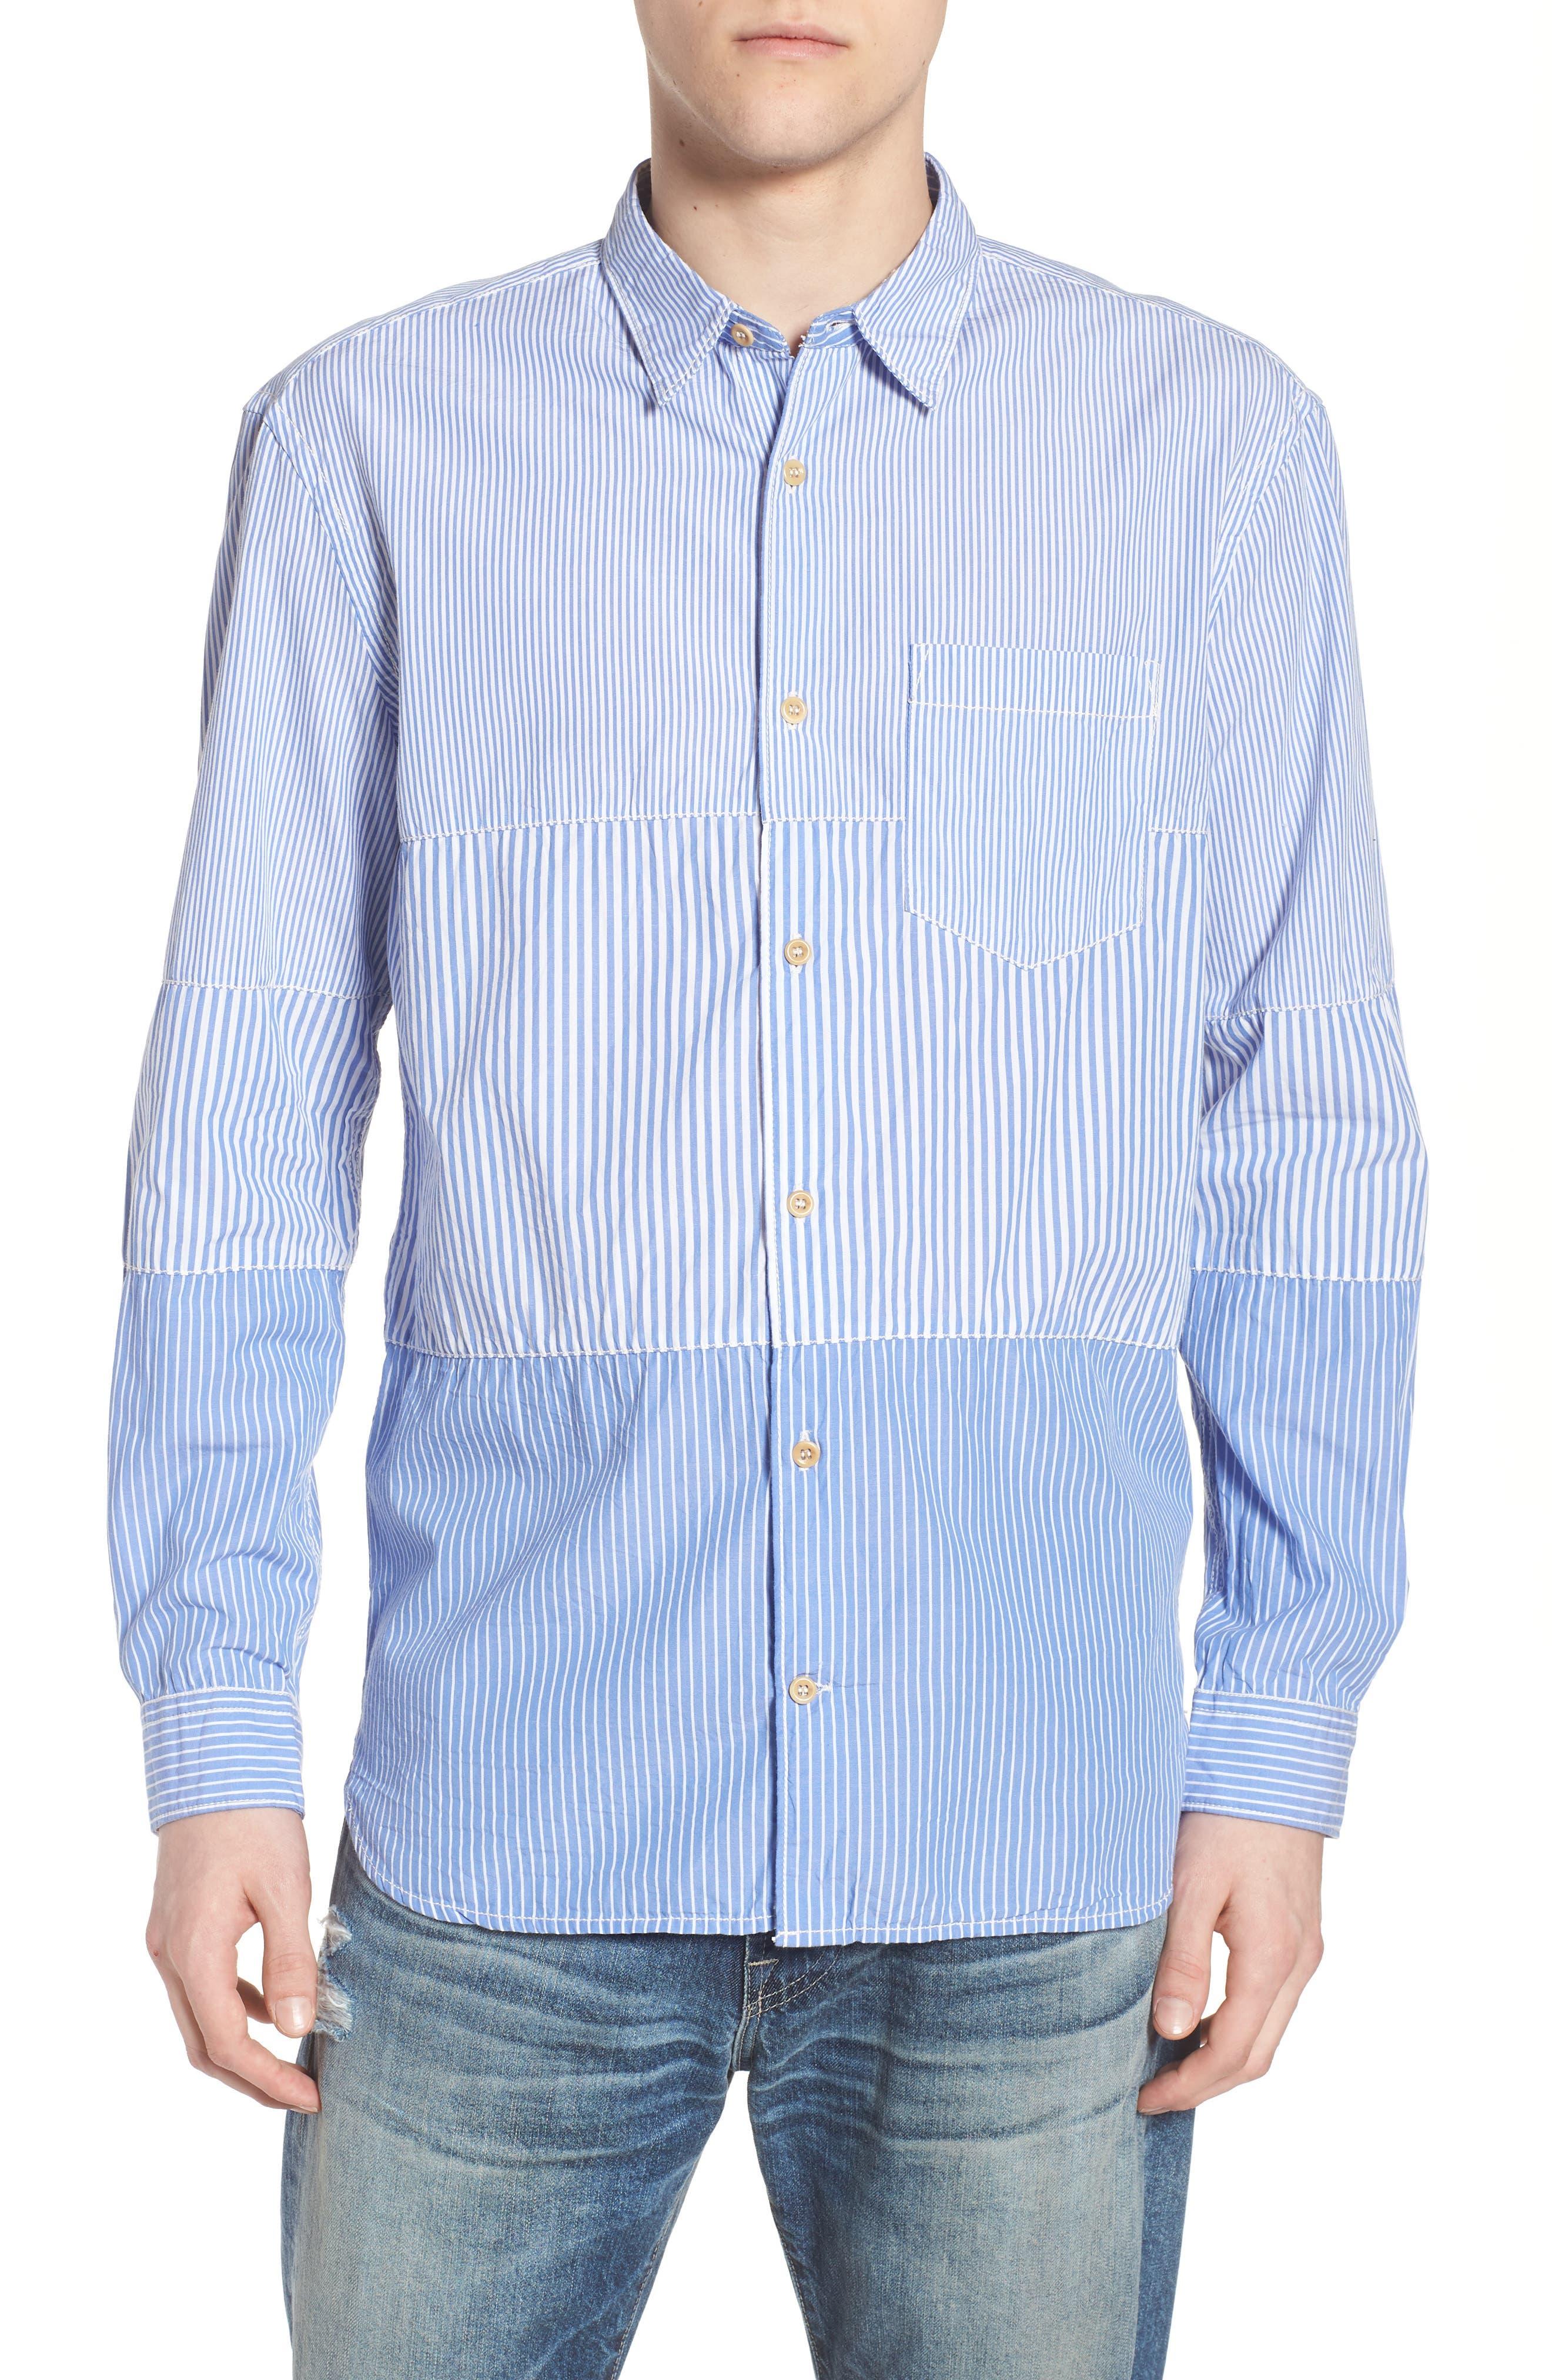 Regular Fit Stripe Sport Shirt,                         Main,                         color, 400